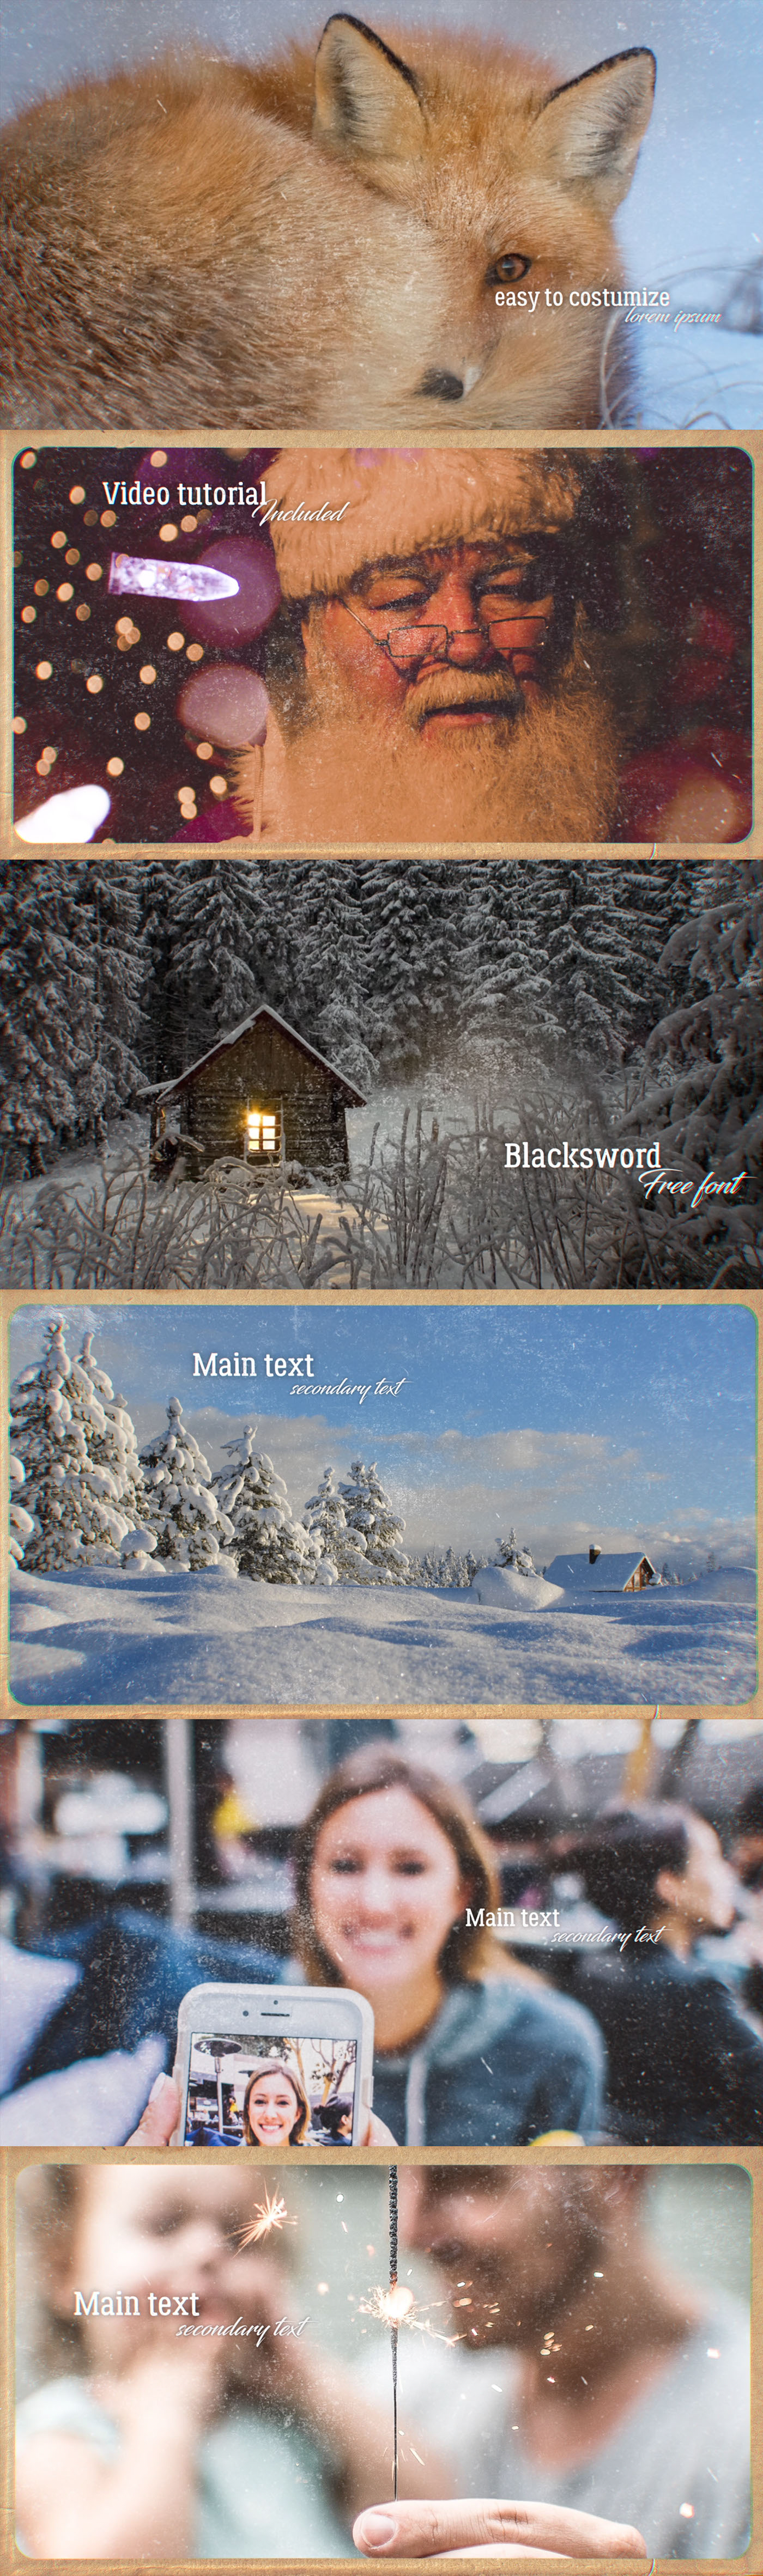 free Kinfolk download slideshow vintage promo old photo new year Christmas brush